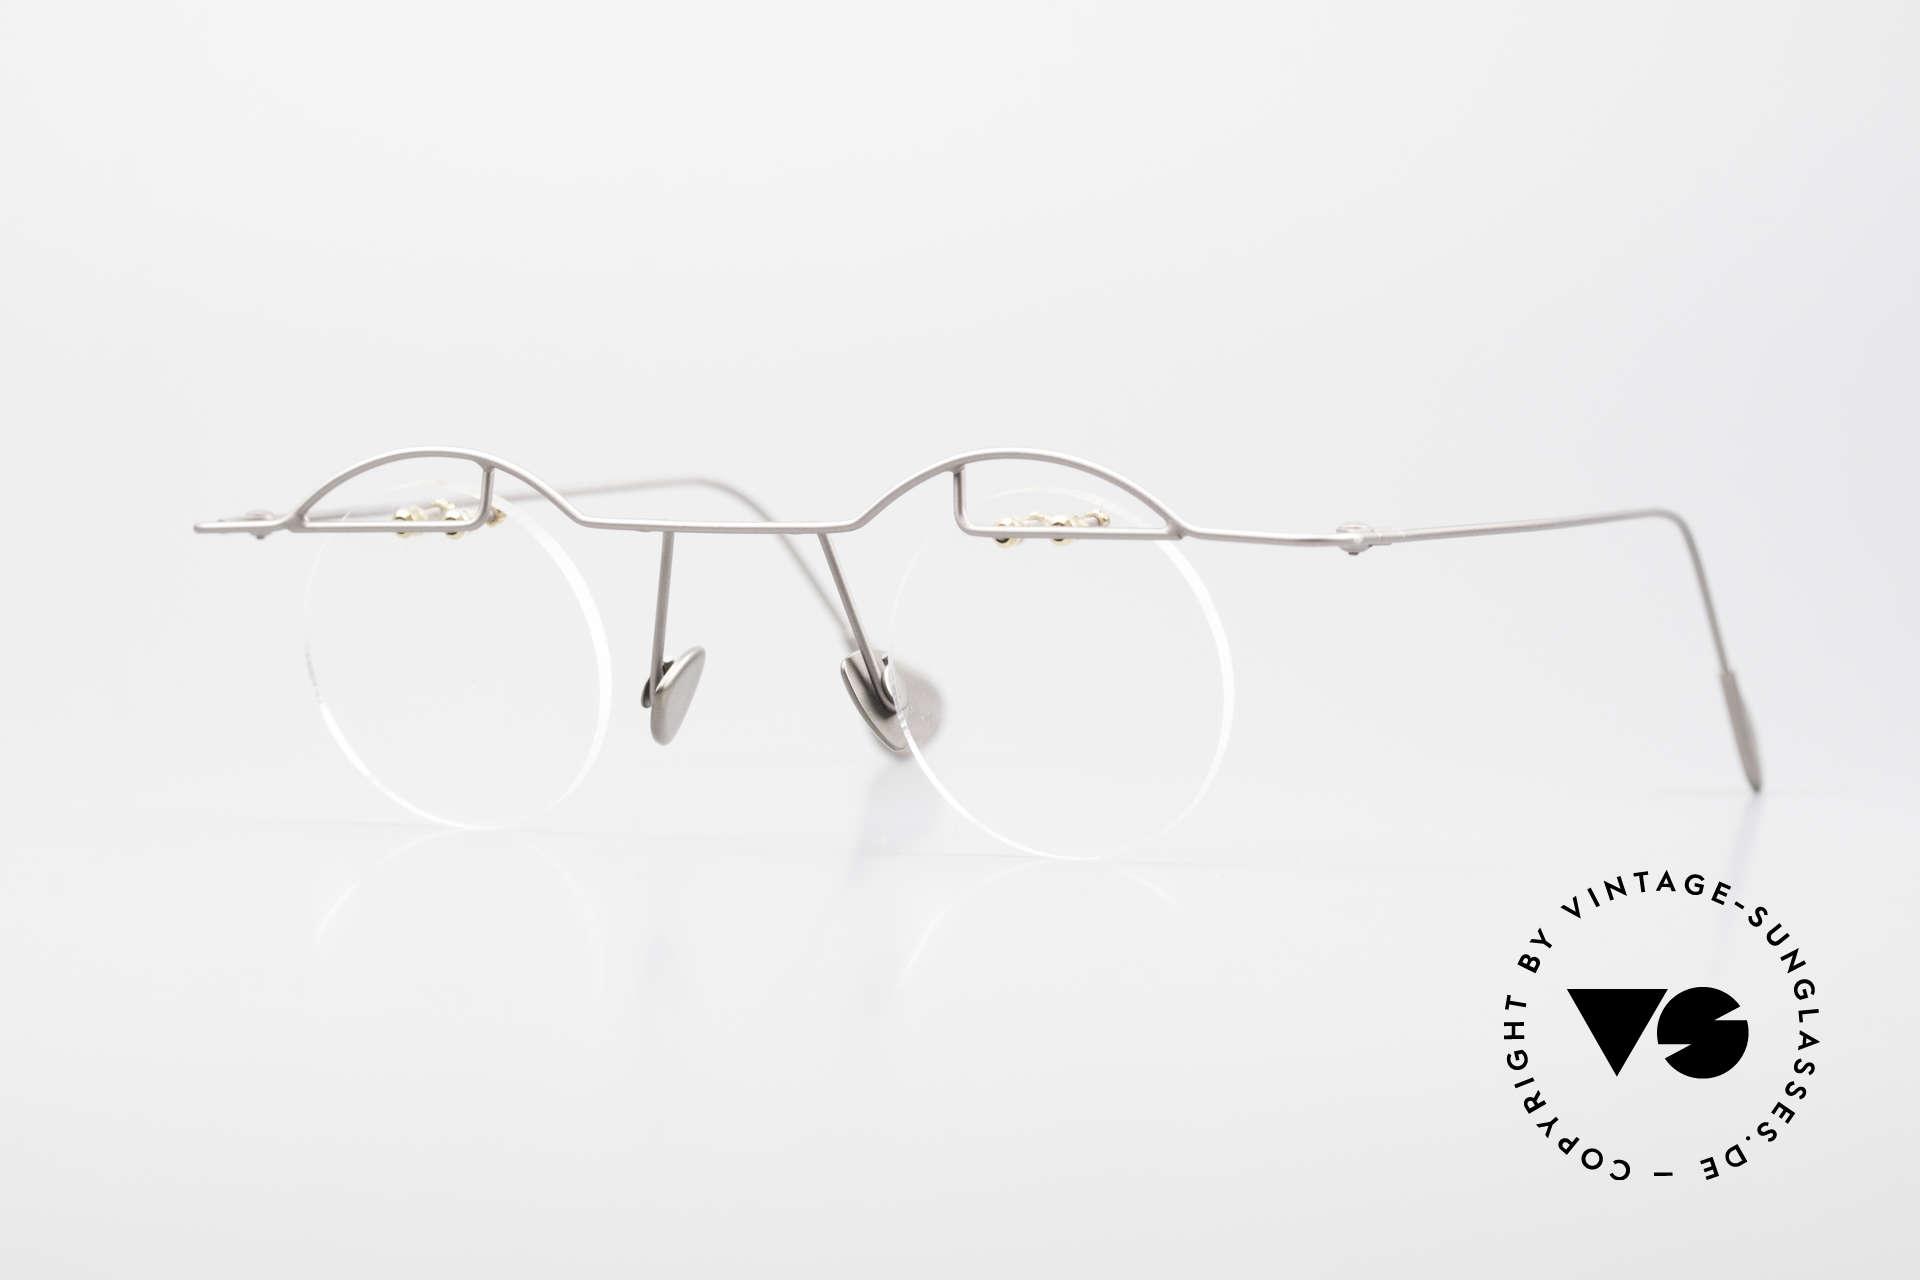 Paul Chiol 02 Rimless Eyeglasses Bauhaus, vintage 90's Paul CHIOL designer eyeglass-frame, Made for Men and Women